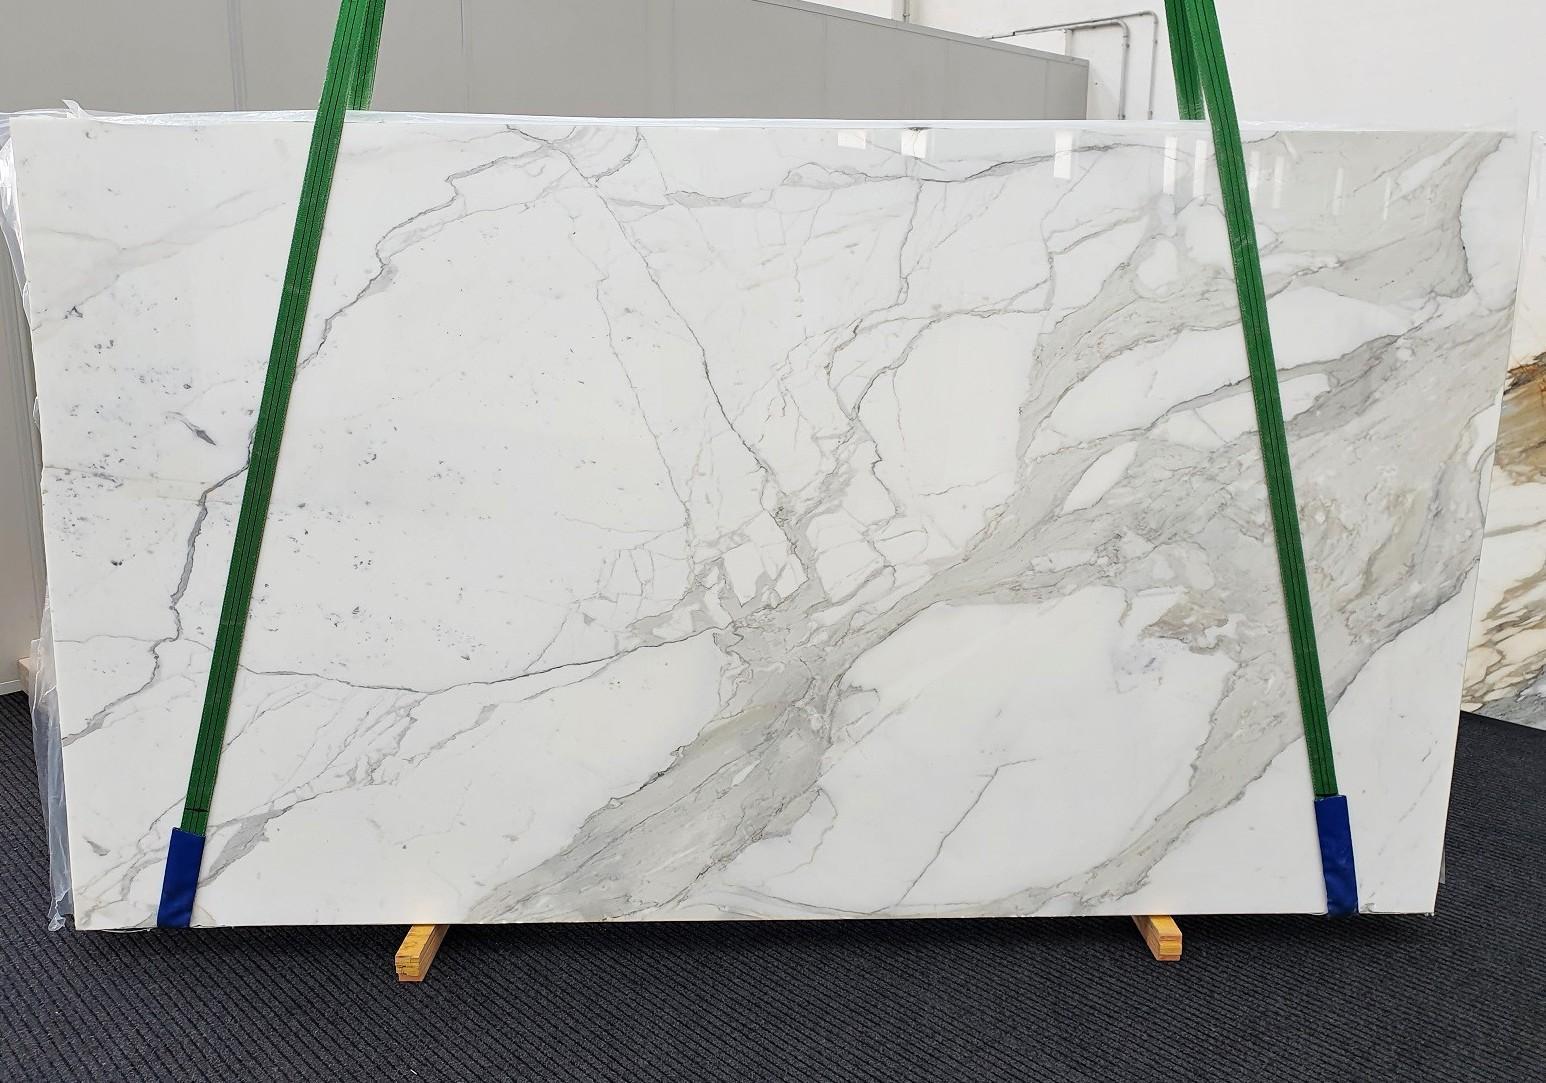 CALACATTA EXTRA Fourniture Veneto (Italie) d' dalles brillantes en marbre naturel 1377 , Slab #63